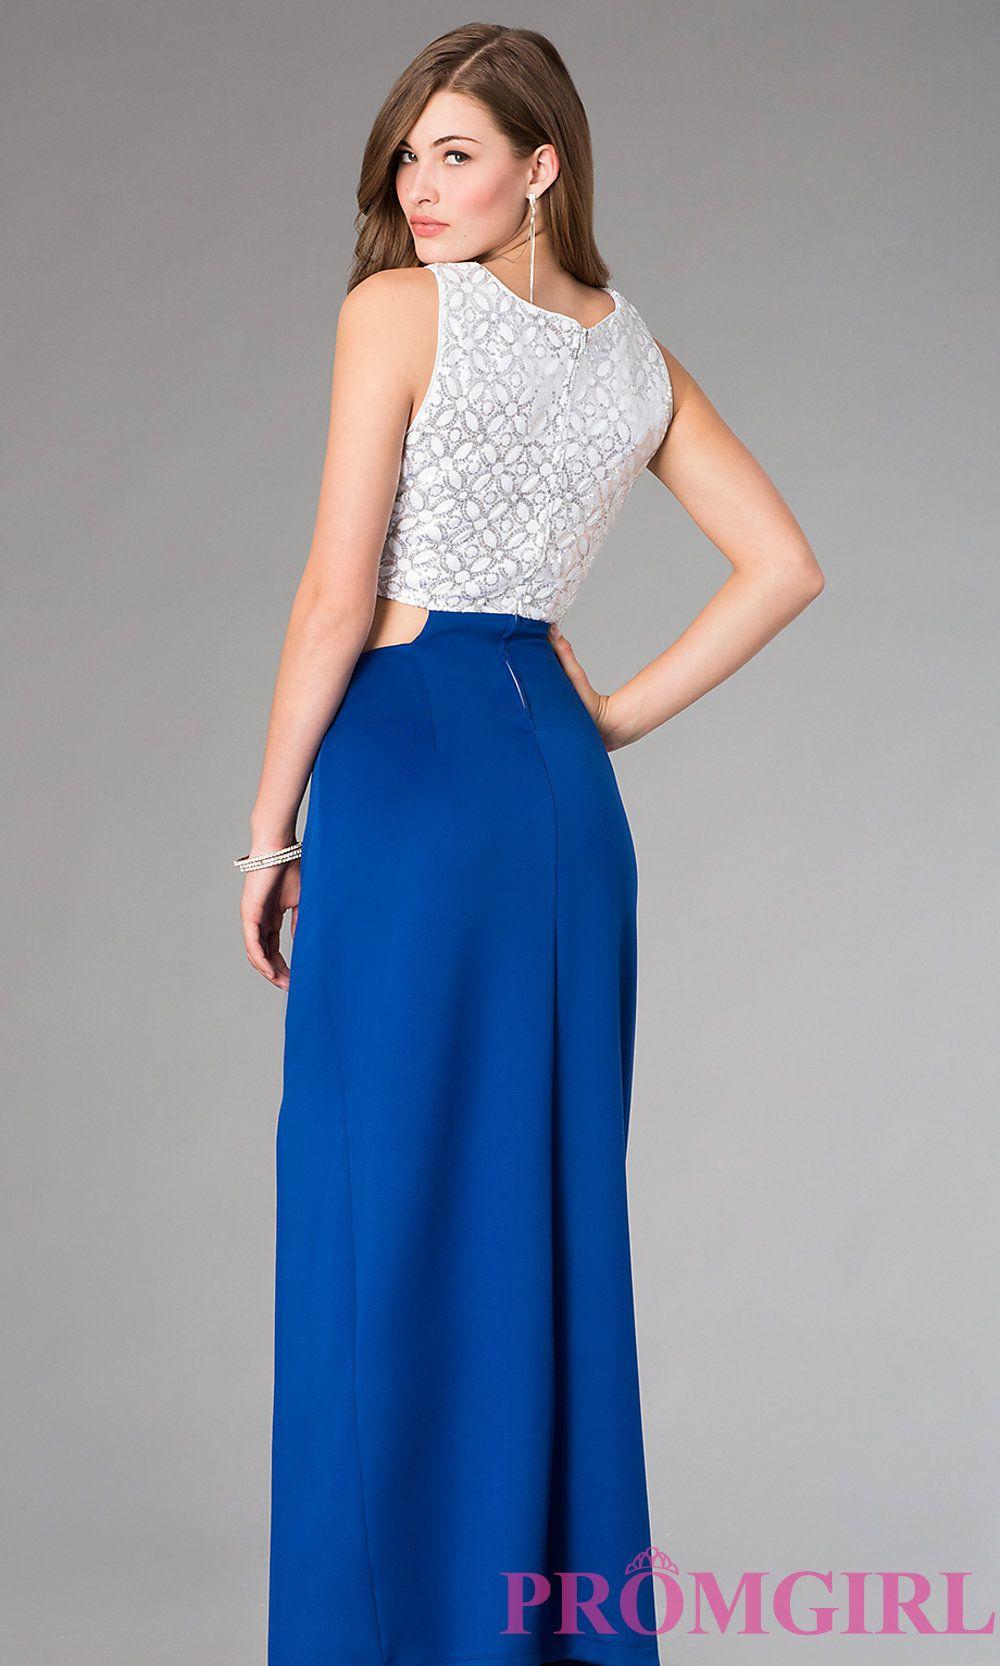 Size of prom dresses $50 $100 | Beautiful dresses | Pinterest ...